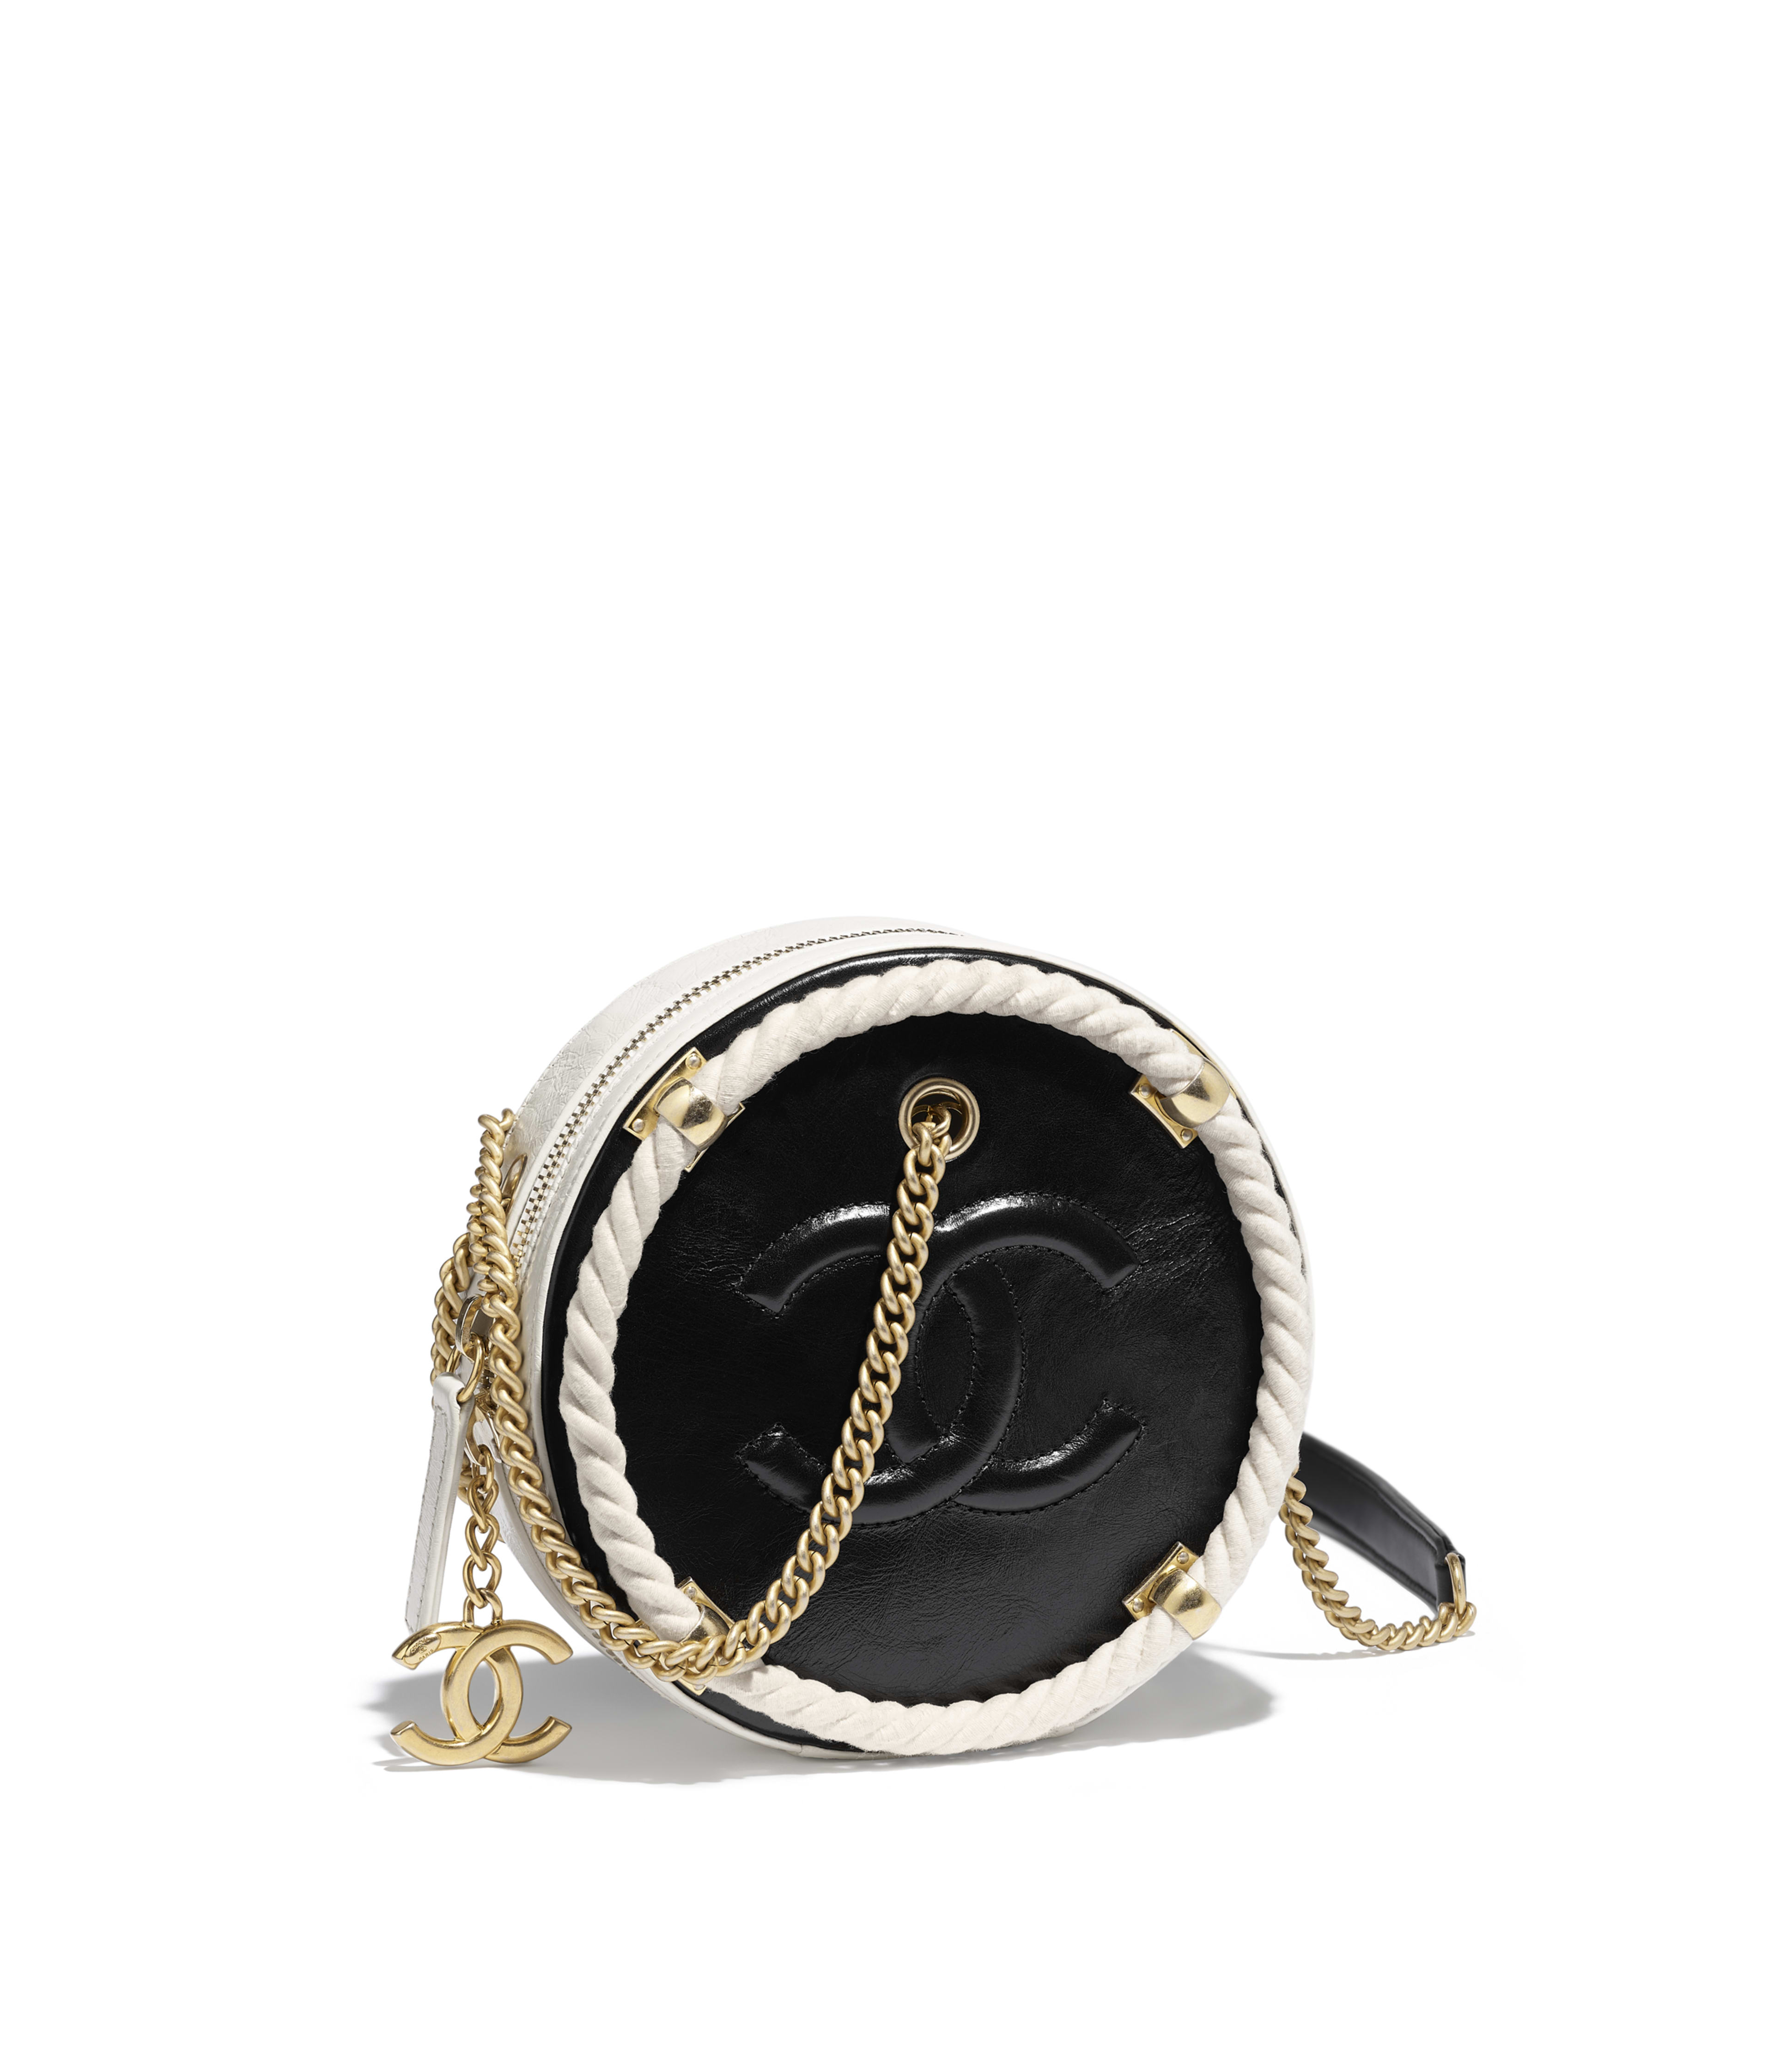 Small Round Bag Crumpled Calfskin